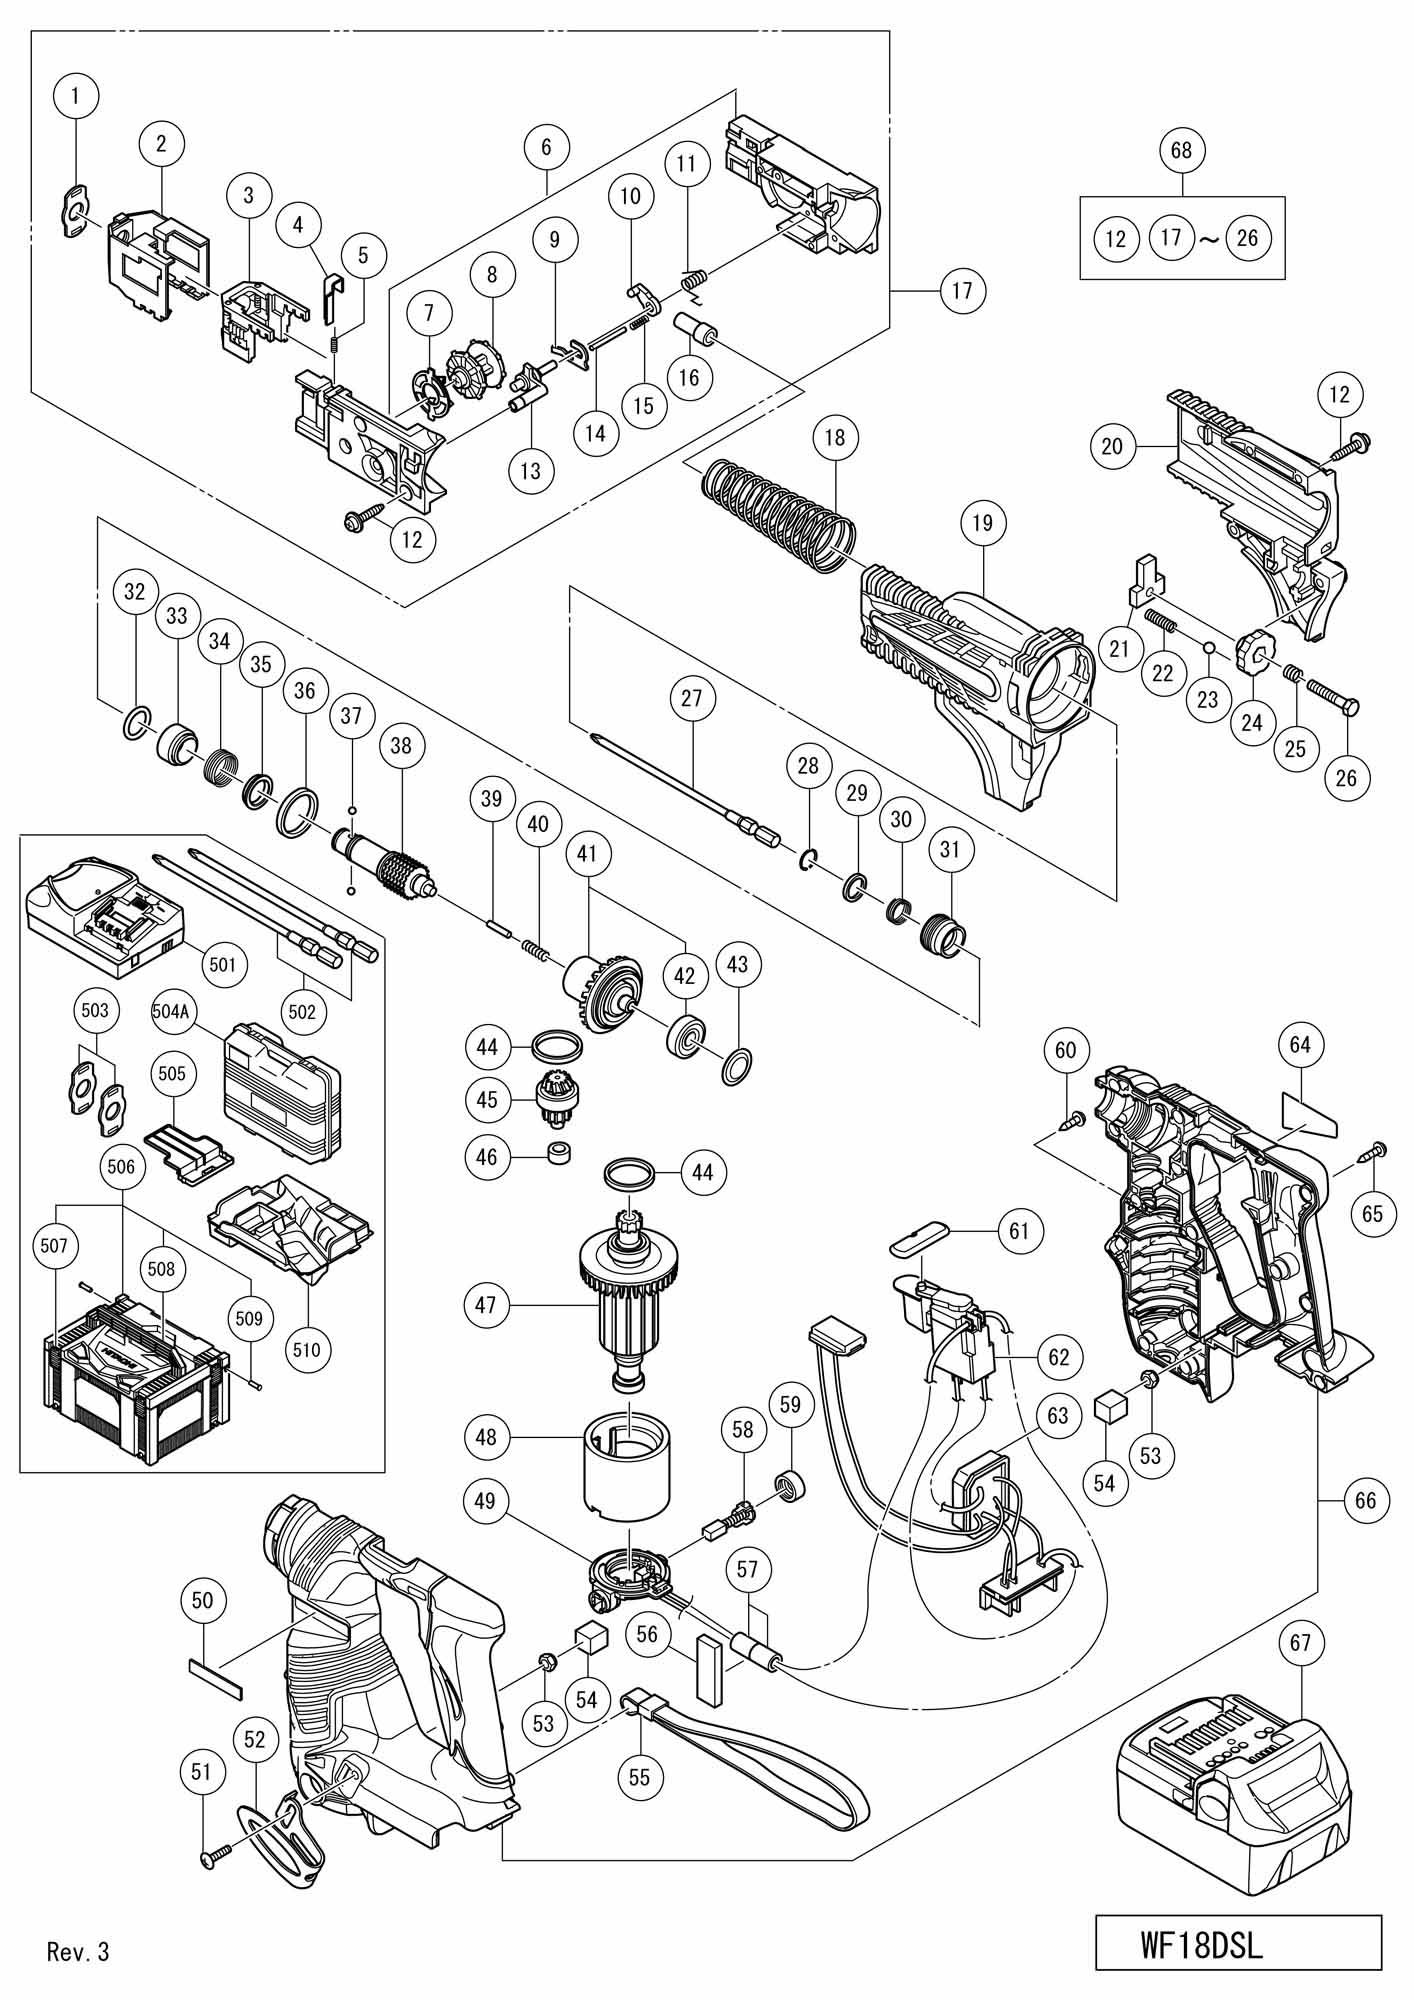 Hitachi Cordless Automatic Screw Driver Wf 18dsl SPARE